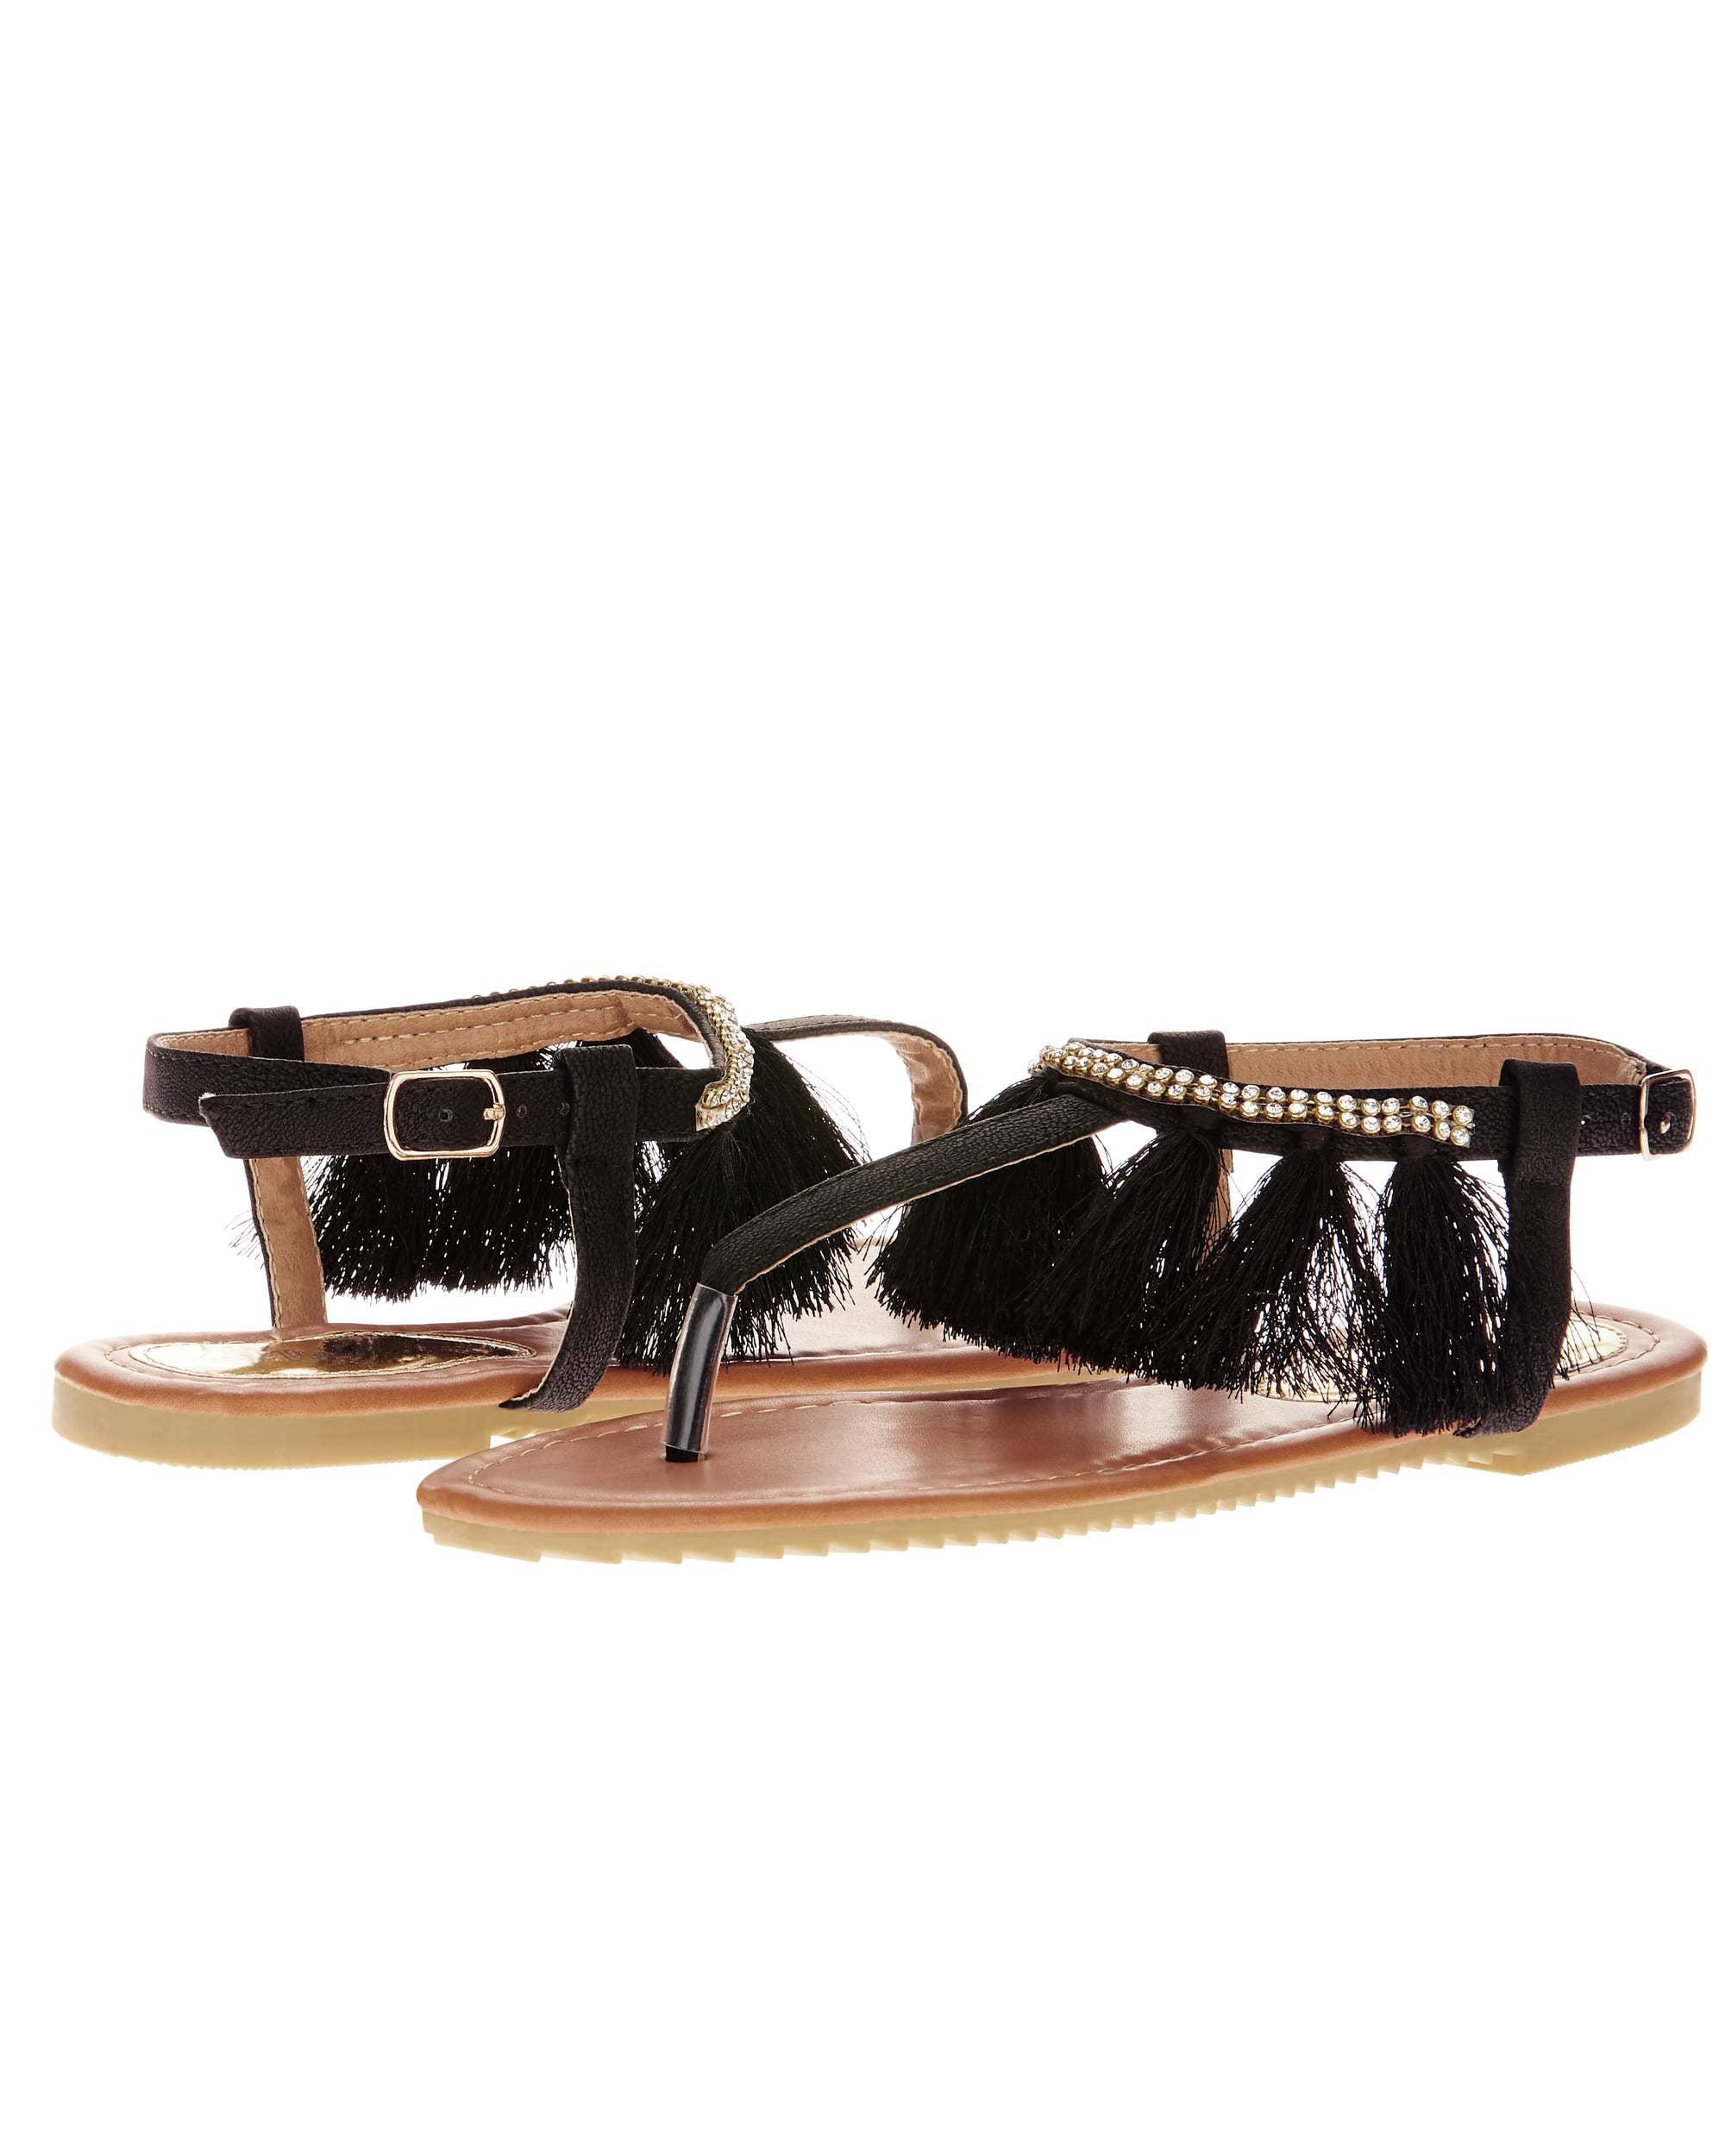 Victoria K Women's Fringe Design sandals